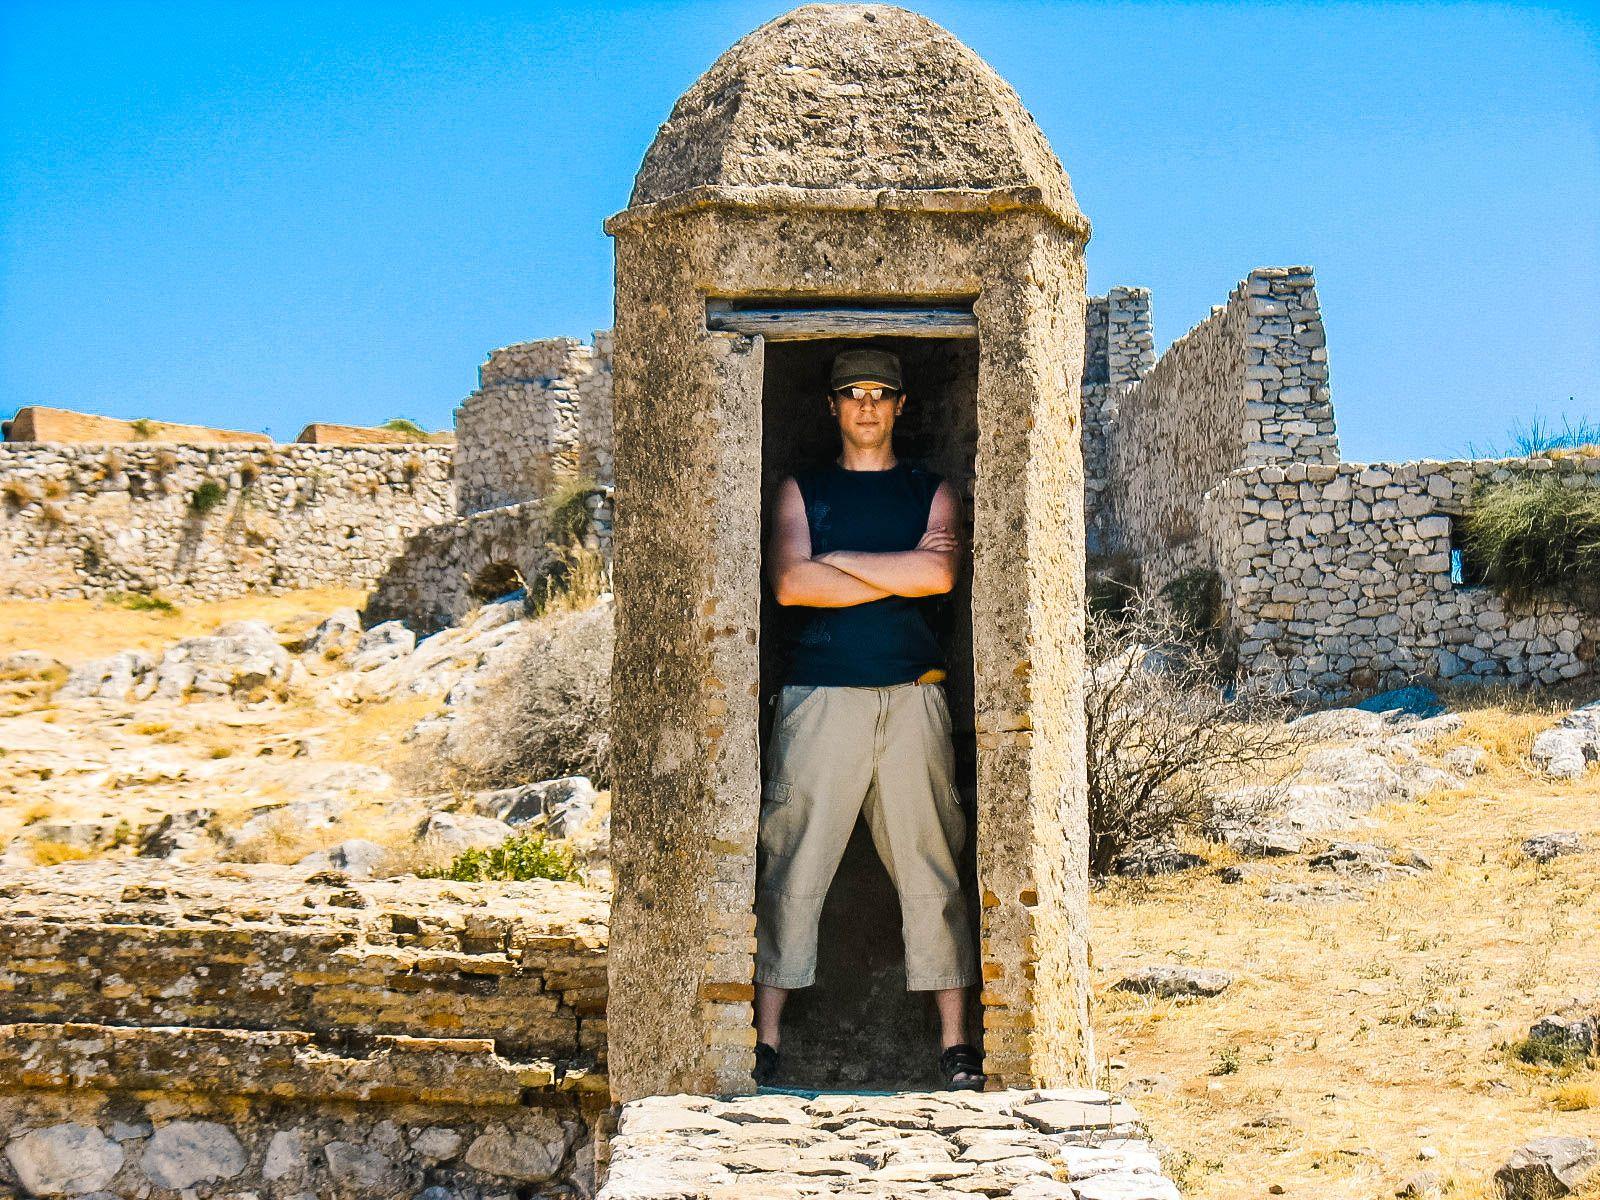 Когда наконец-то нашел тенёк, Греция (17.07.2008)